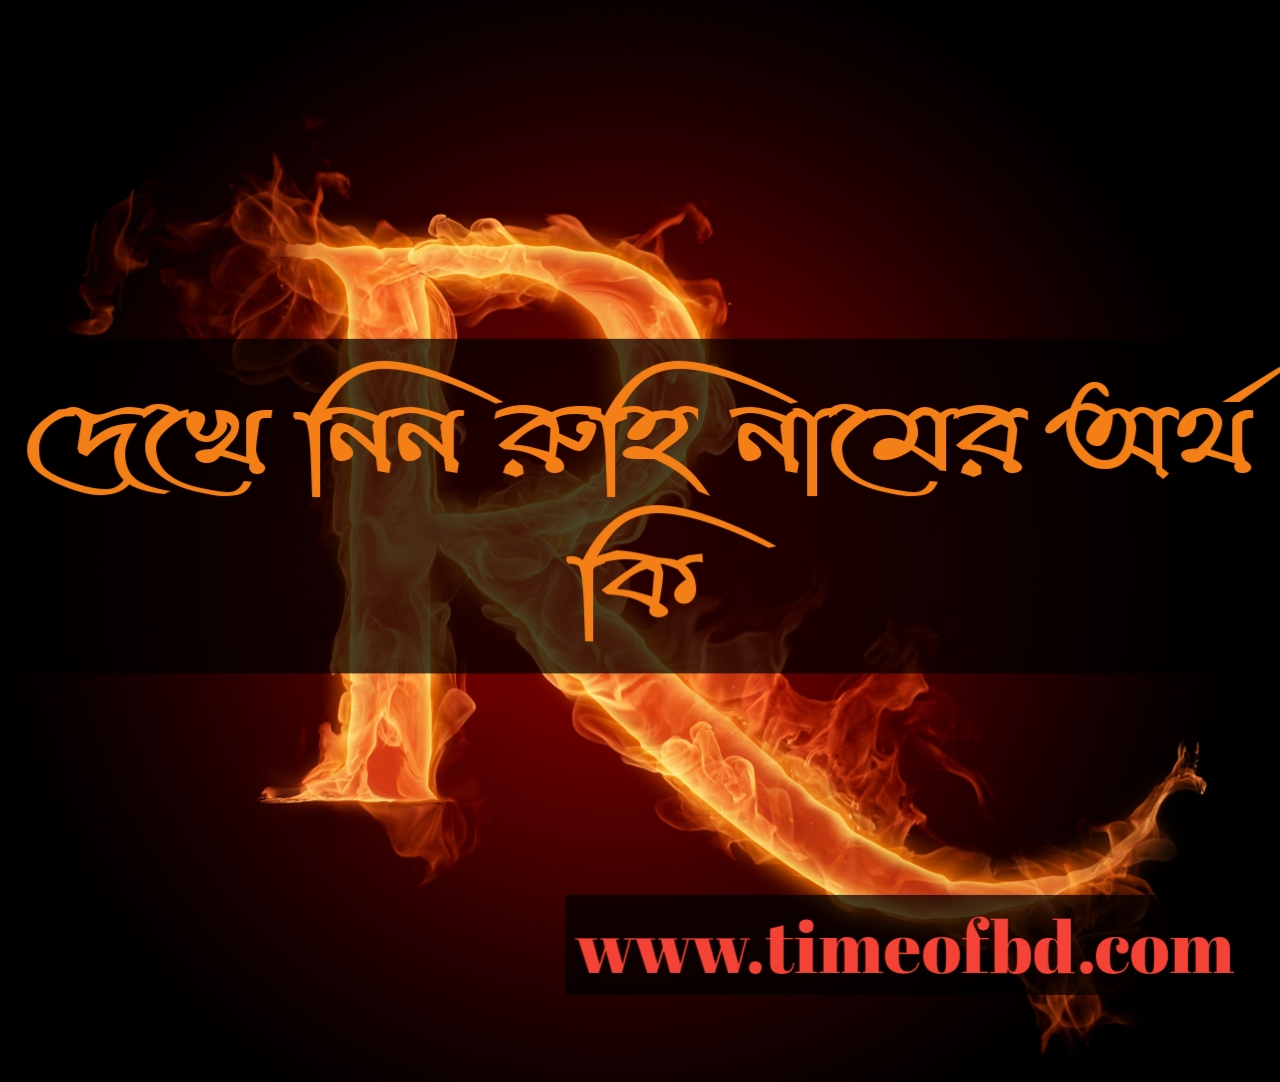 ruhi name meaning in Bengali, রুহি নামের অর্থ কি, রুহি নামের বাংলা অর্থ কি, রুহি নামের ইসলামিক অর্থ কি,